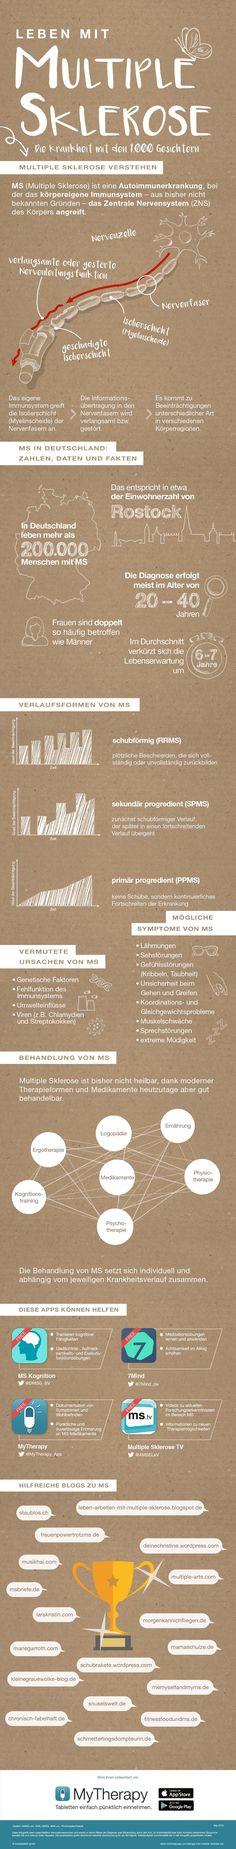 Mutliple Sklerose erklärt in einer Infografik